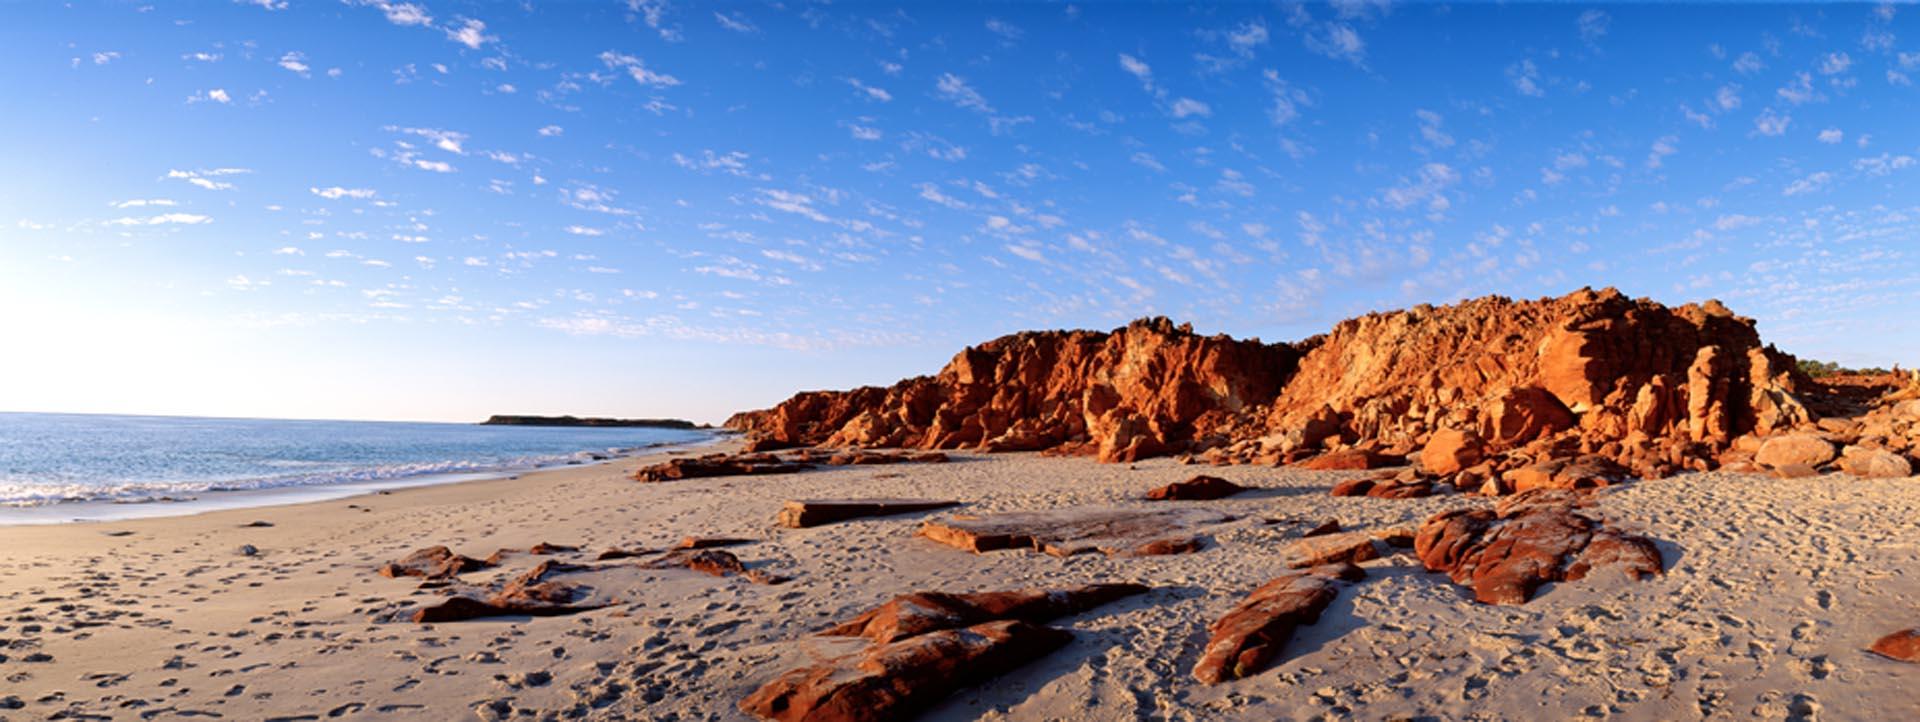 CAPE LEVEQUE TOURS red rocks ocean